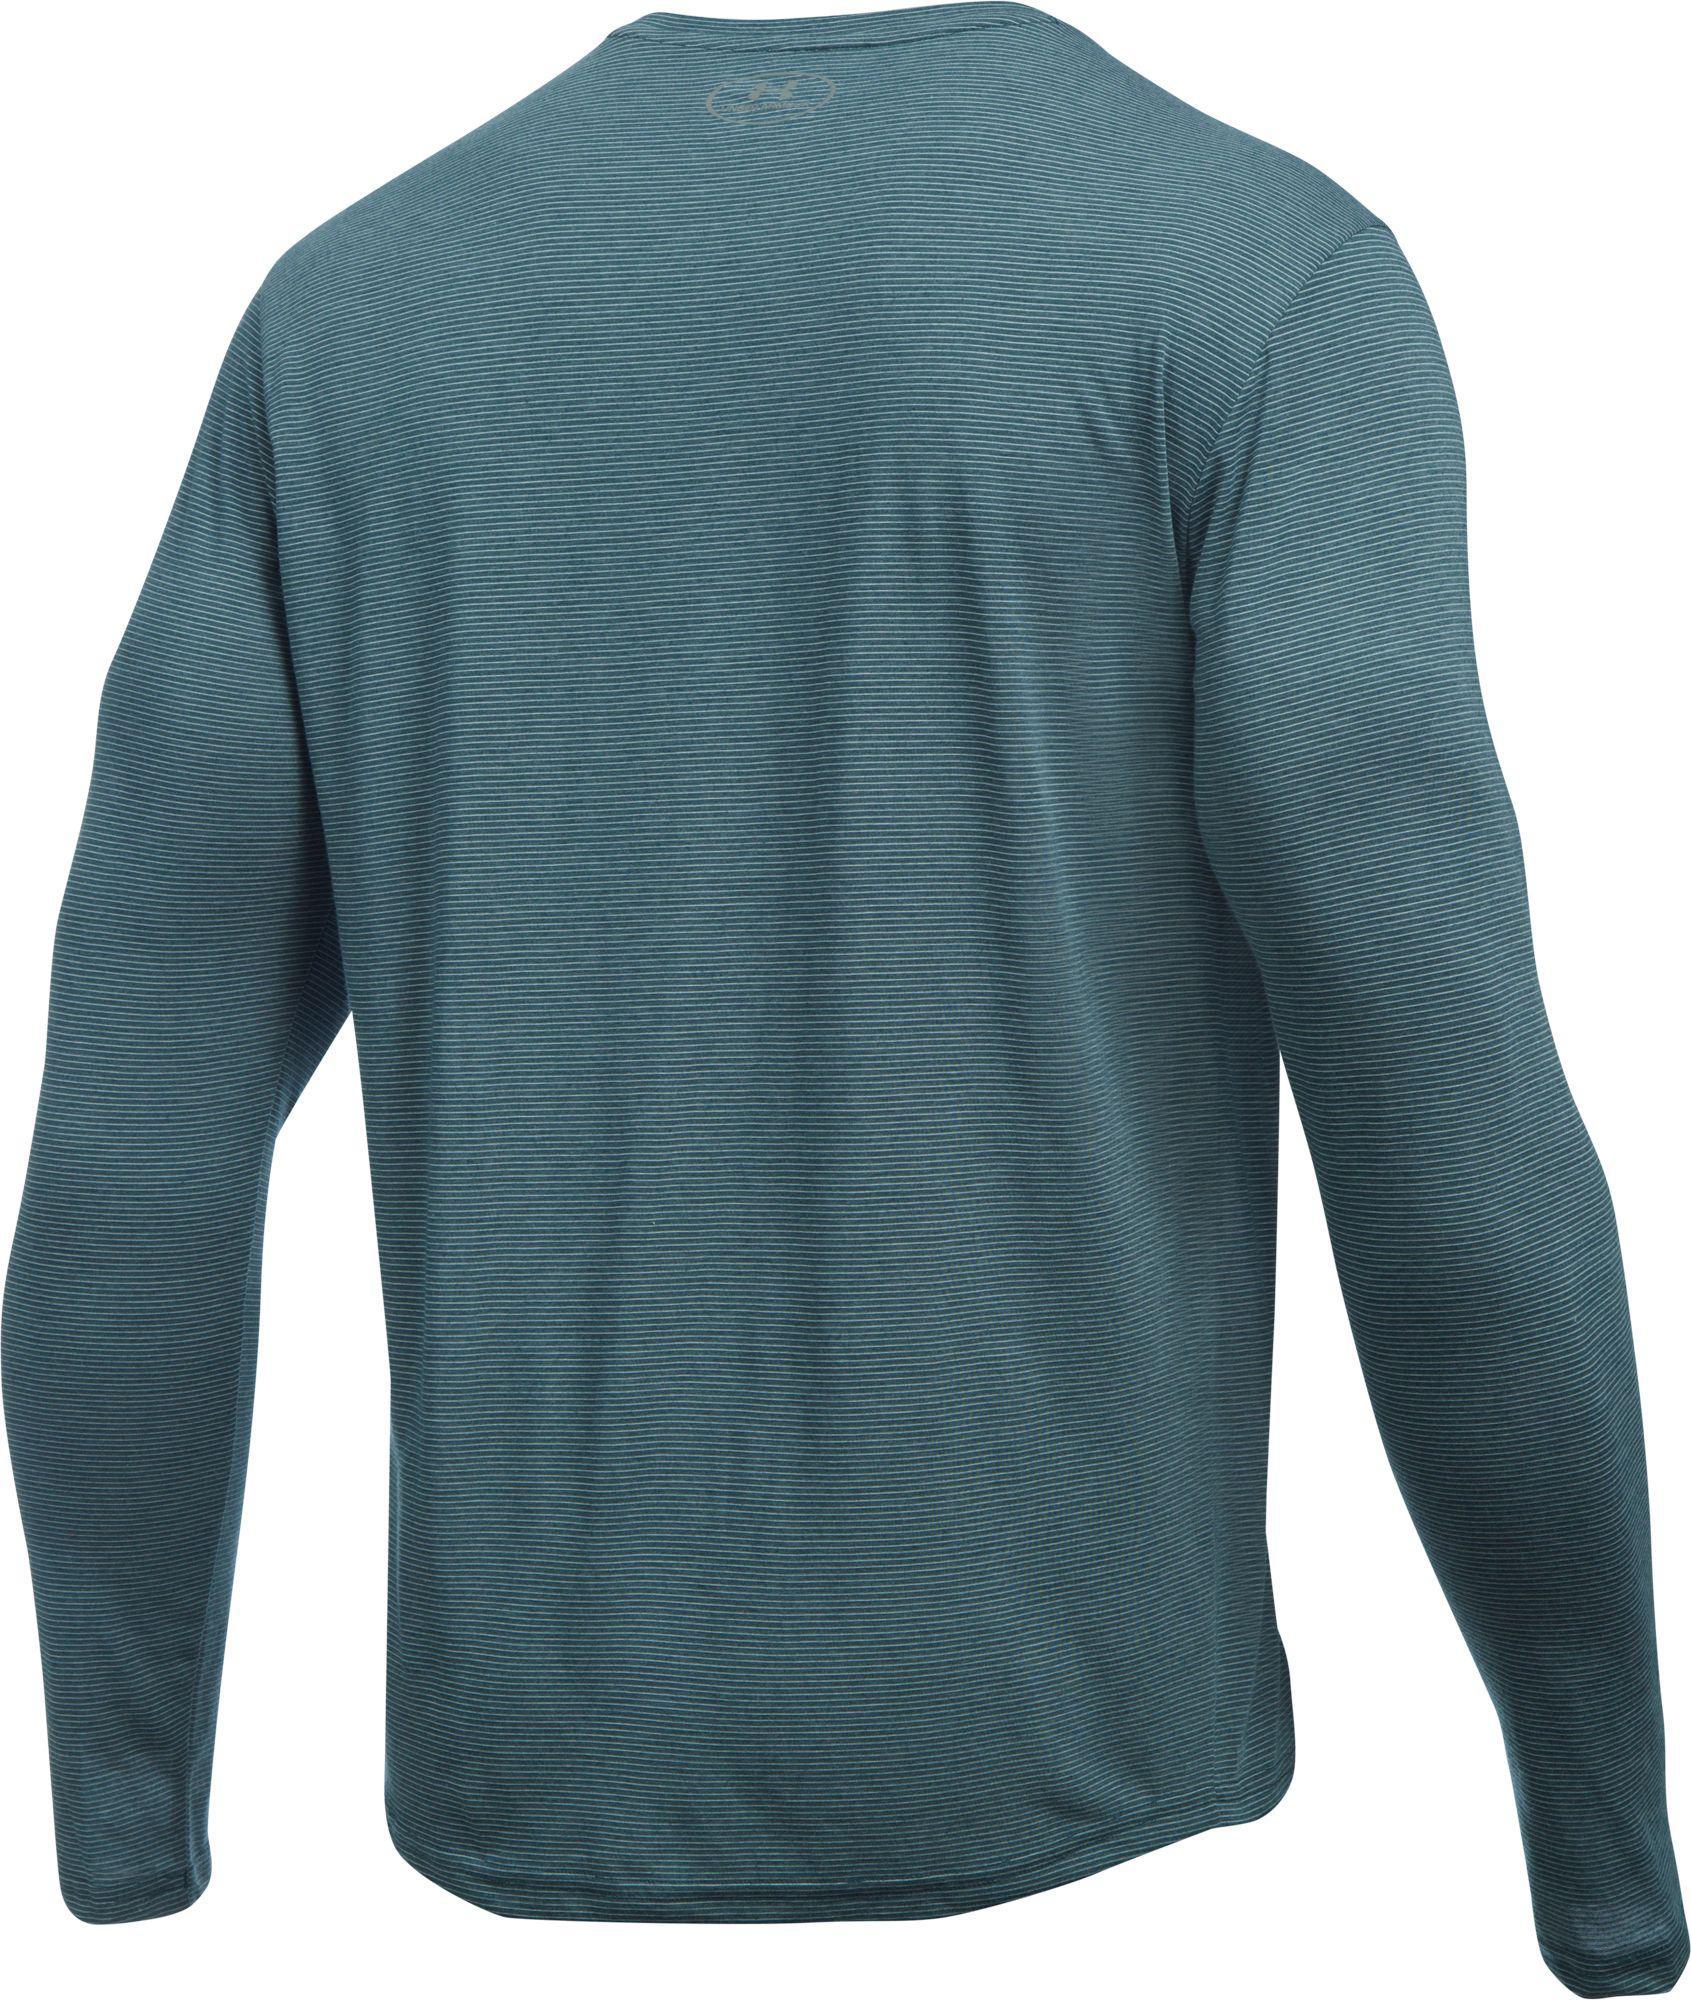 262dbfcec6bd Under Armour - Blue Threadborne Streaker Long Sleeve Running Shirt for Men  - Lyst